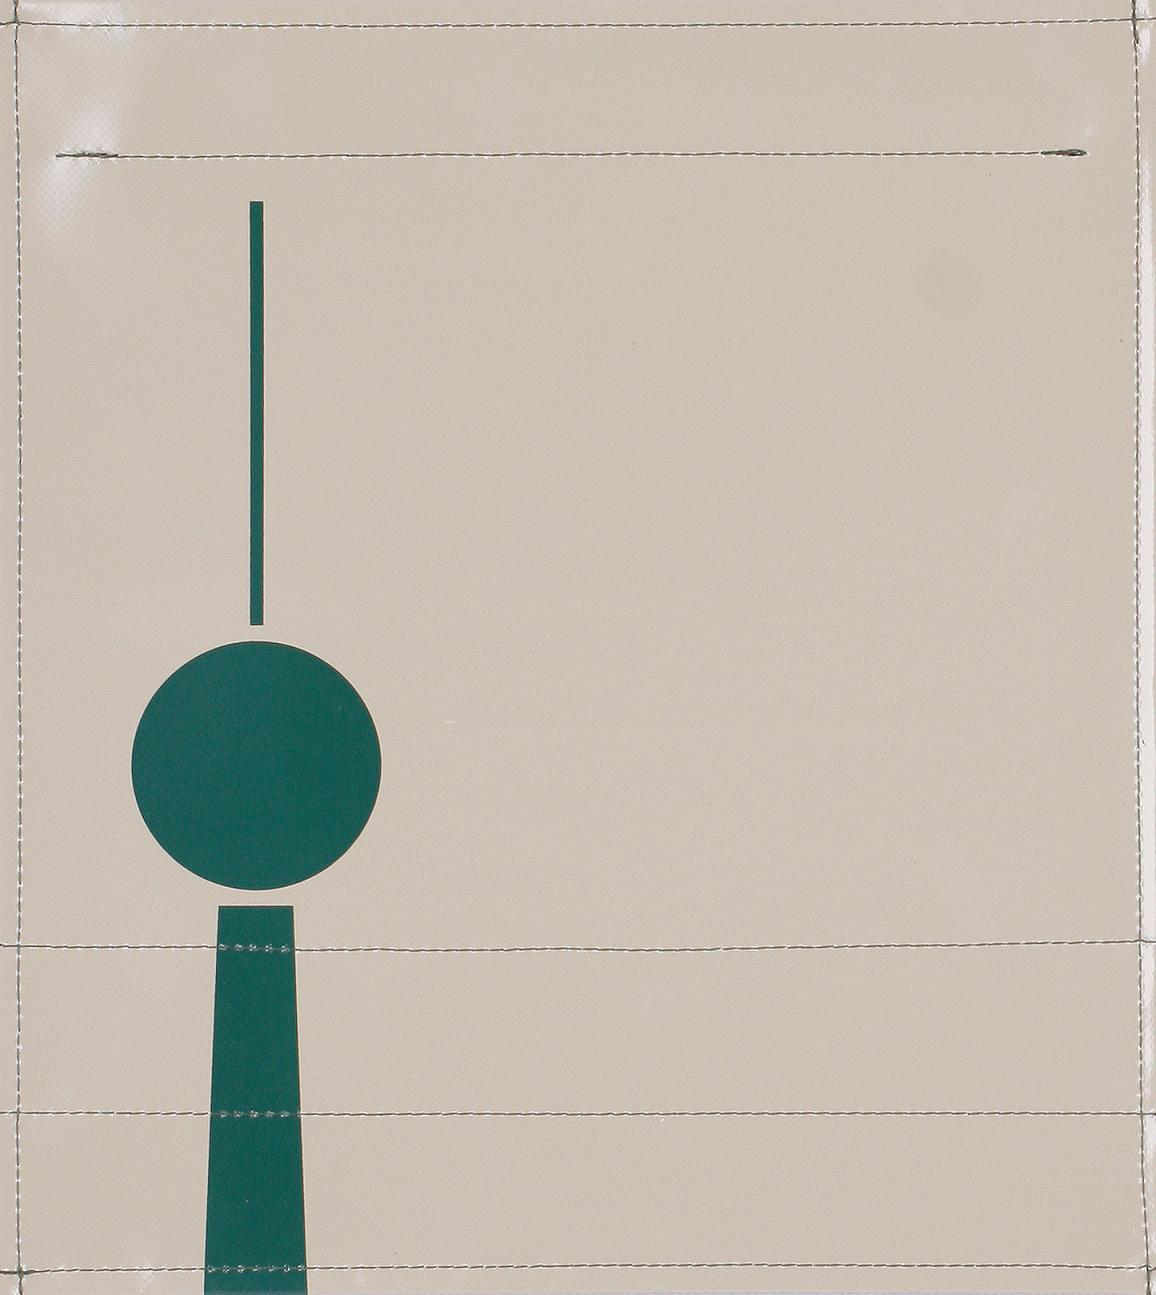 Fernsehturm helloliv/grün (mittel)